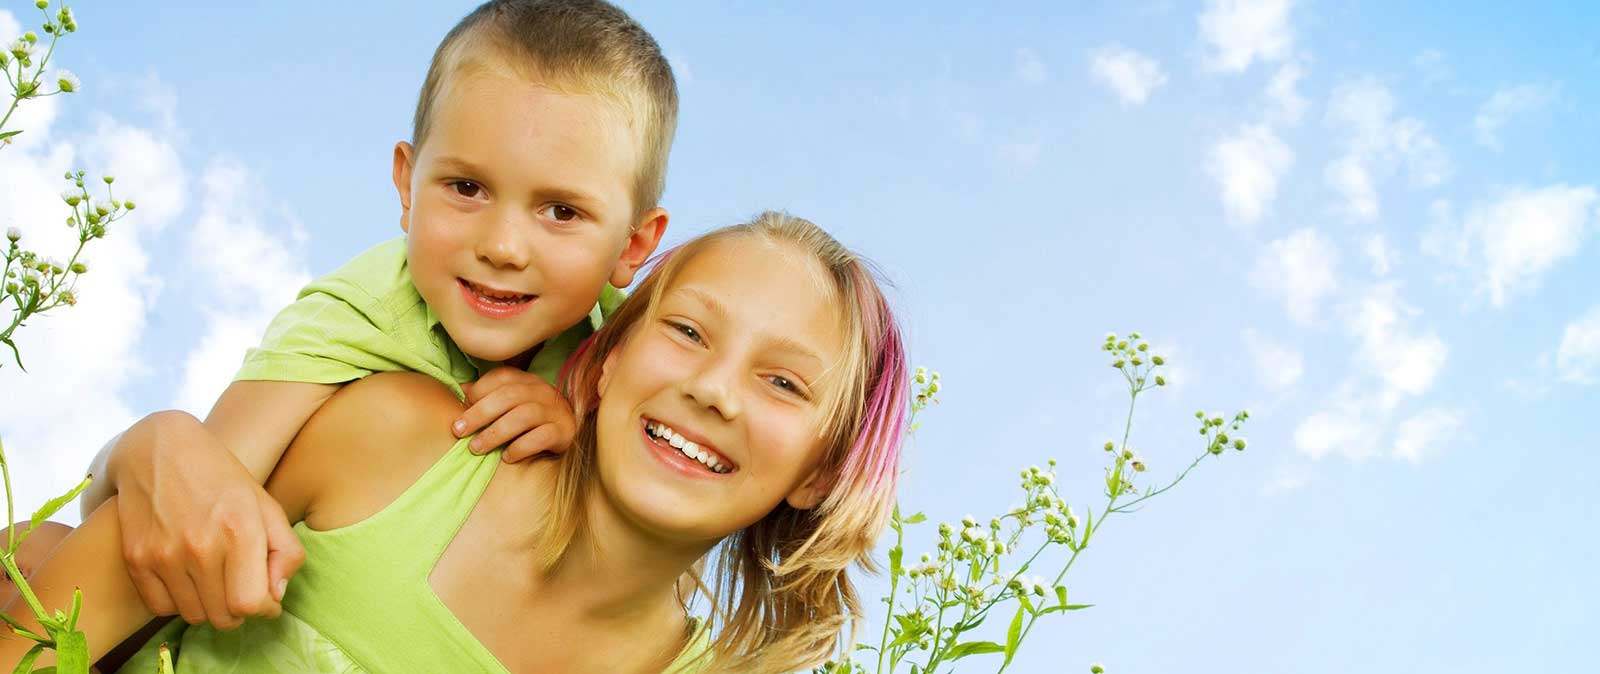 Pediatric Dental Specialist of Hiram | Your Local Hiram Pediatric Dentist